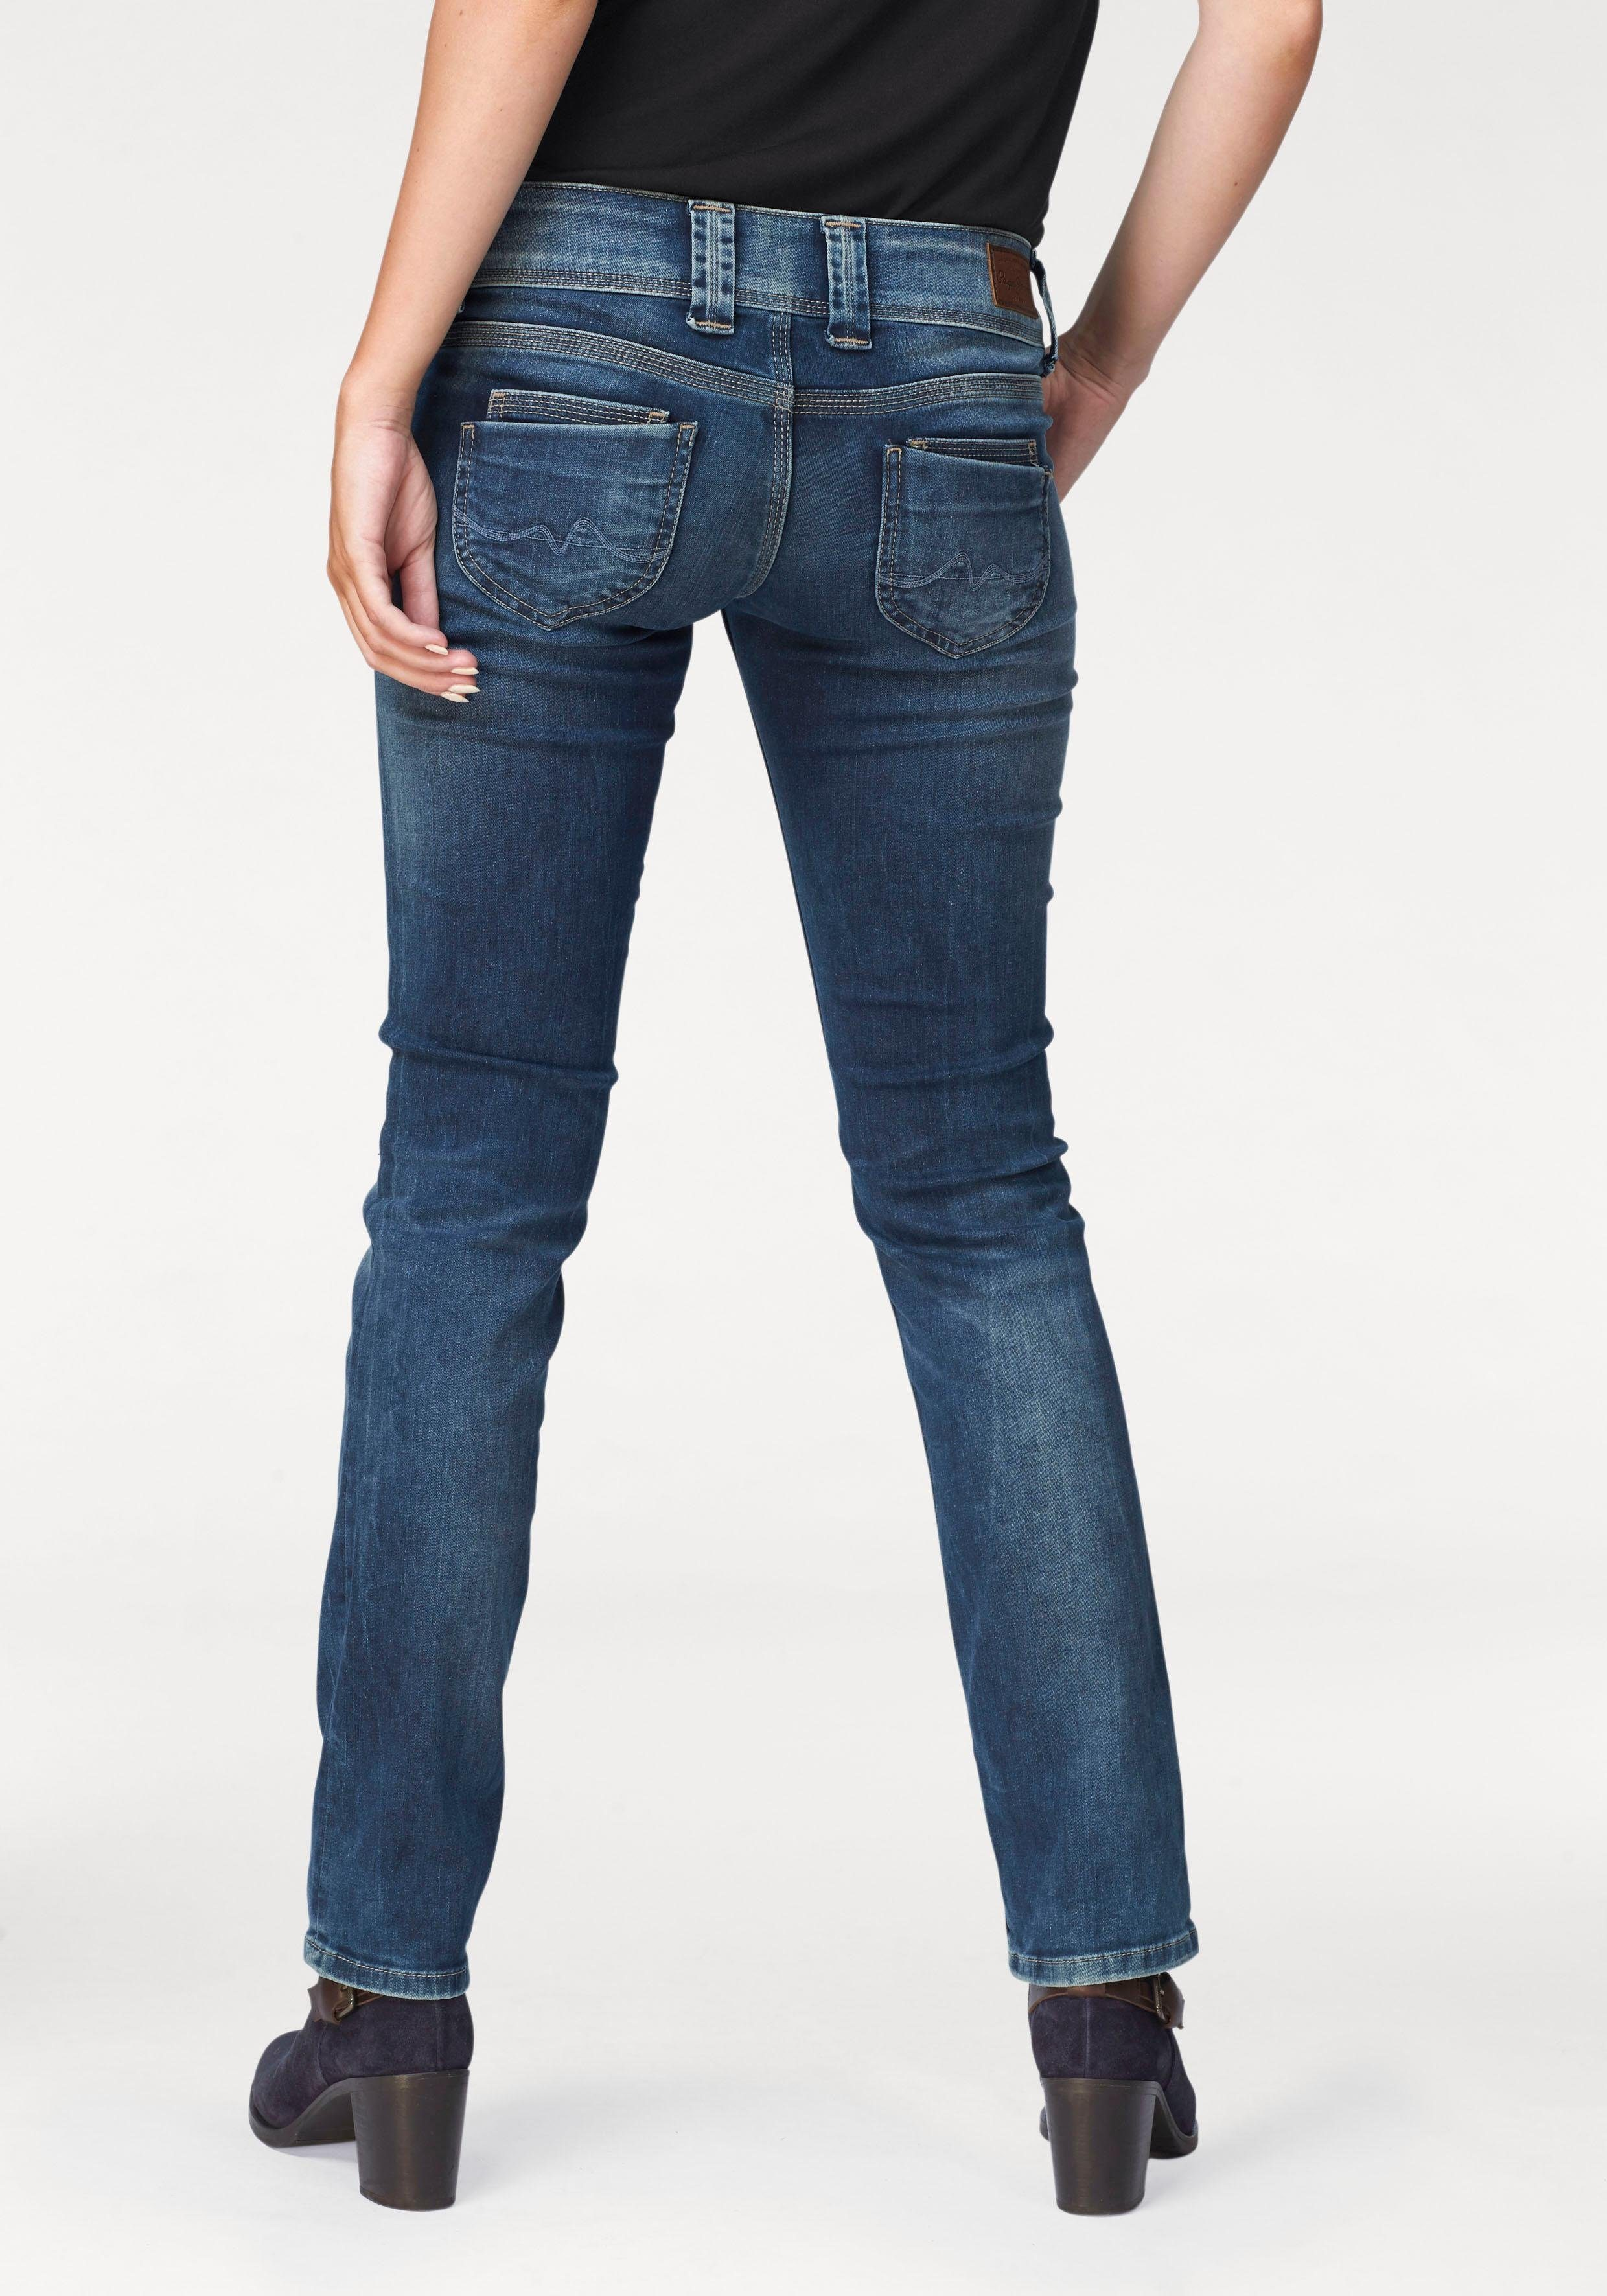 pepe jeans schwsrz damen